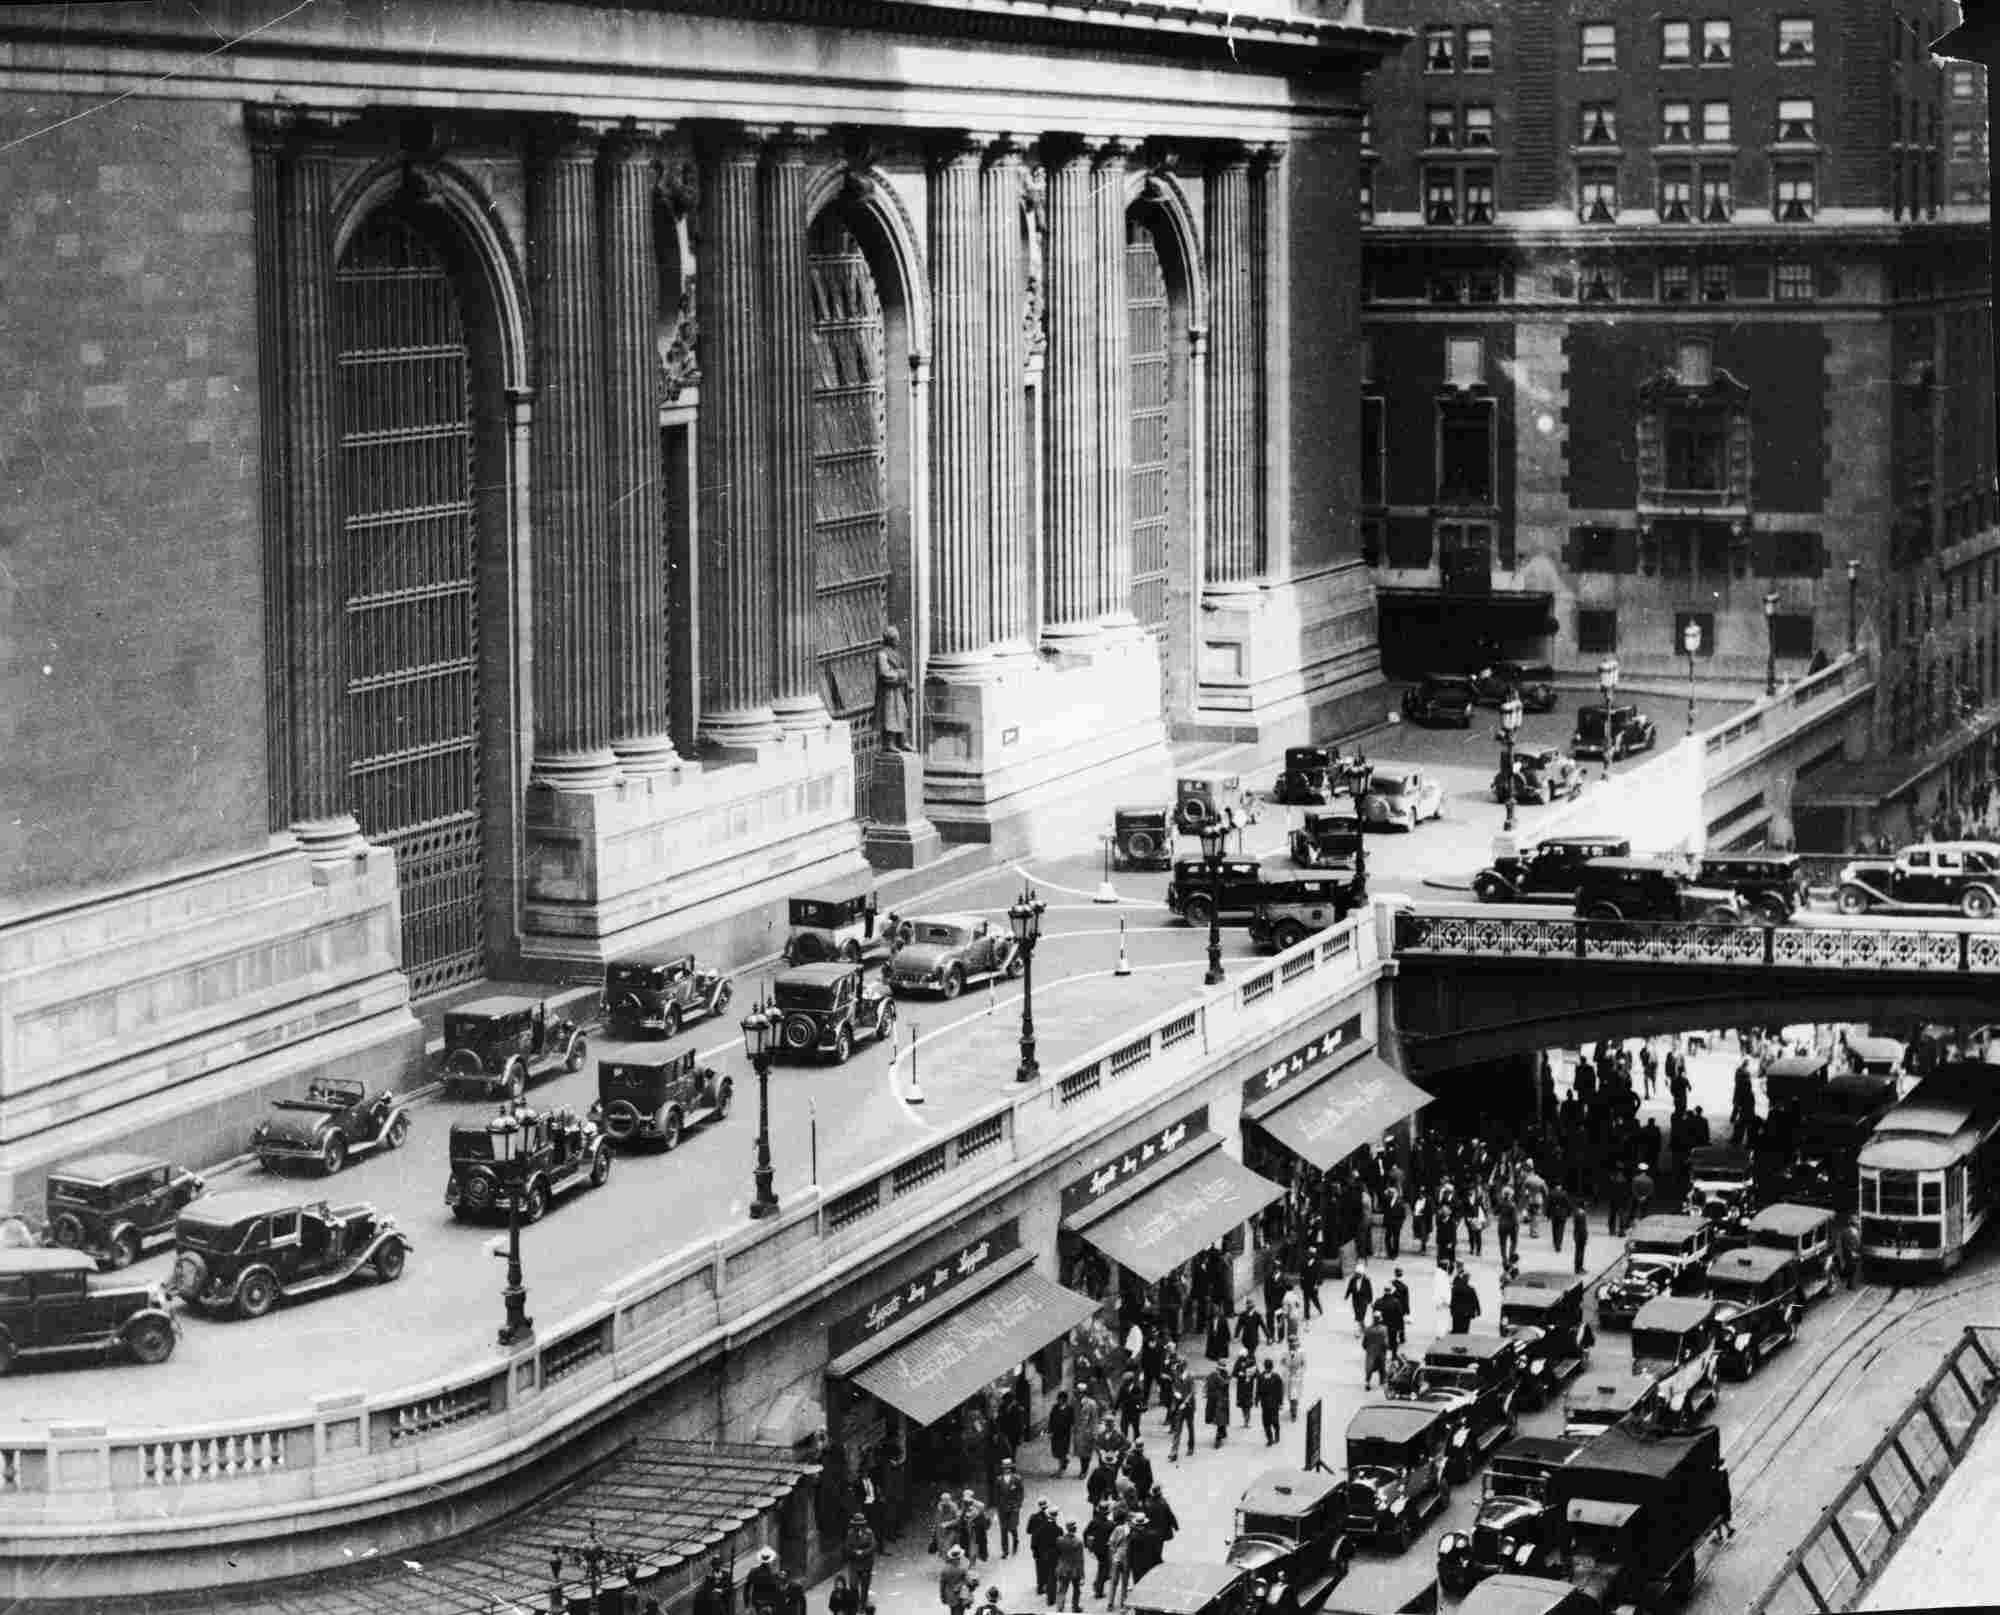 Elevated Park Avenue around Grand Central Terminal c. 1930s